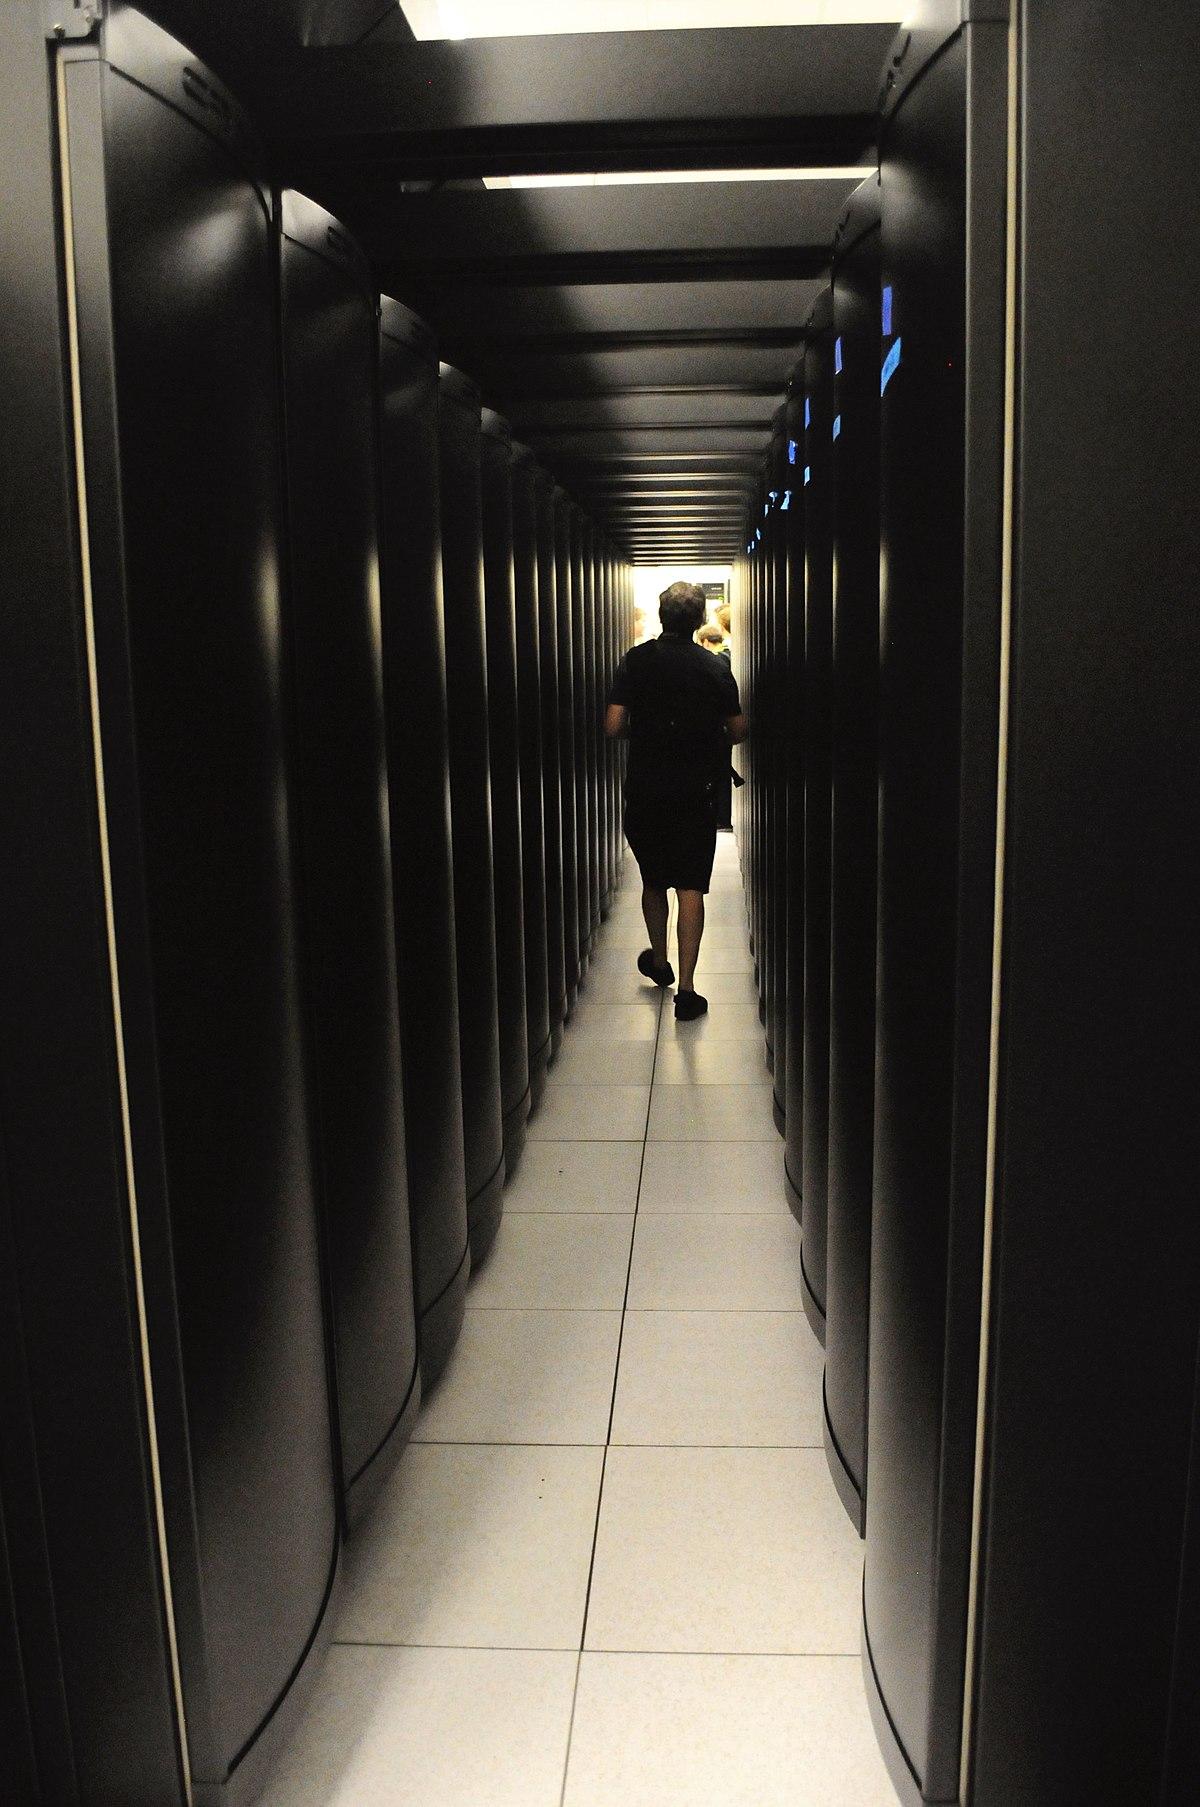 Cray XE6  Wikipedia